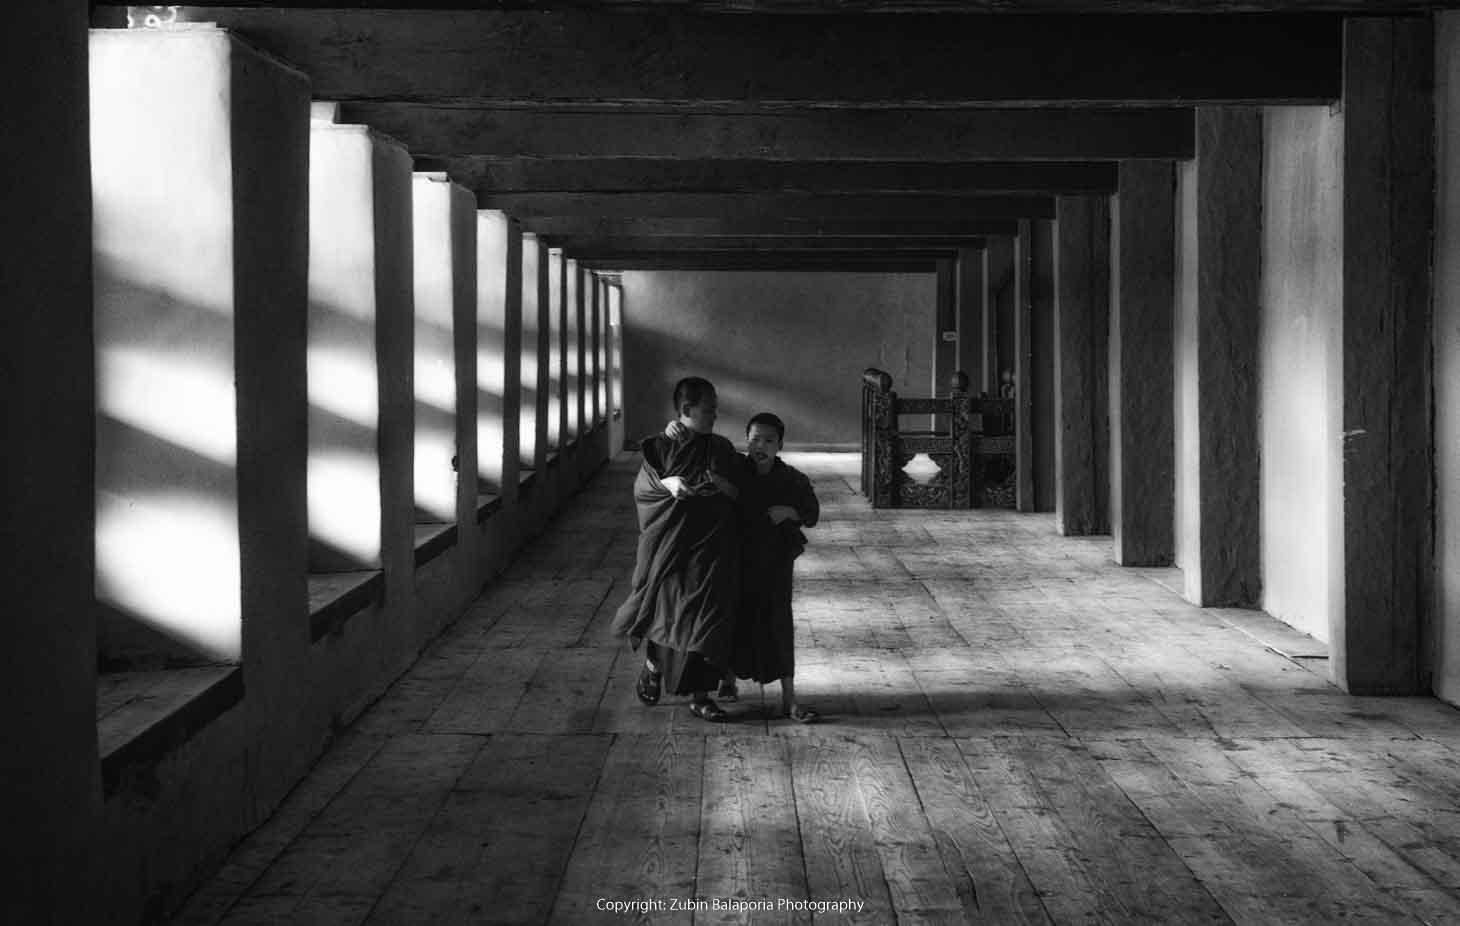 BHU Pillar Hall Monks 20 BW.jpg